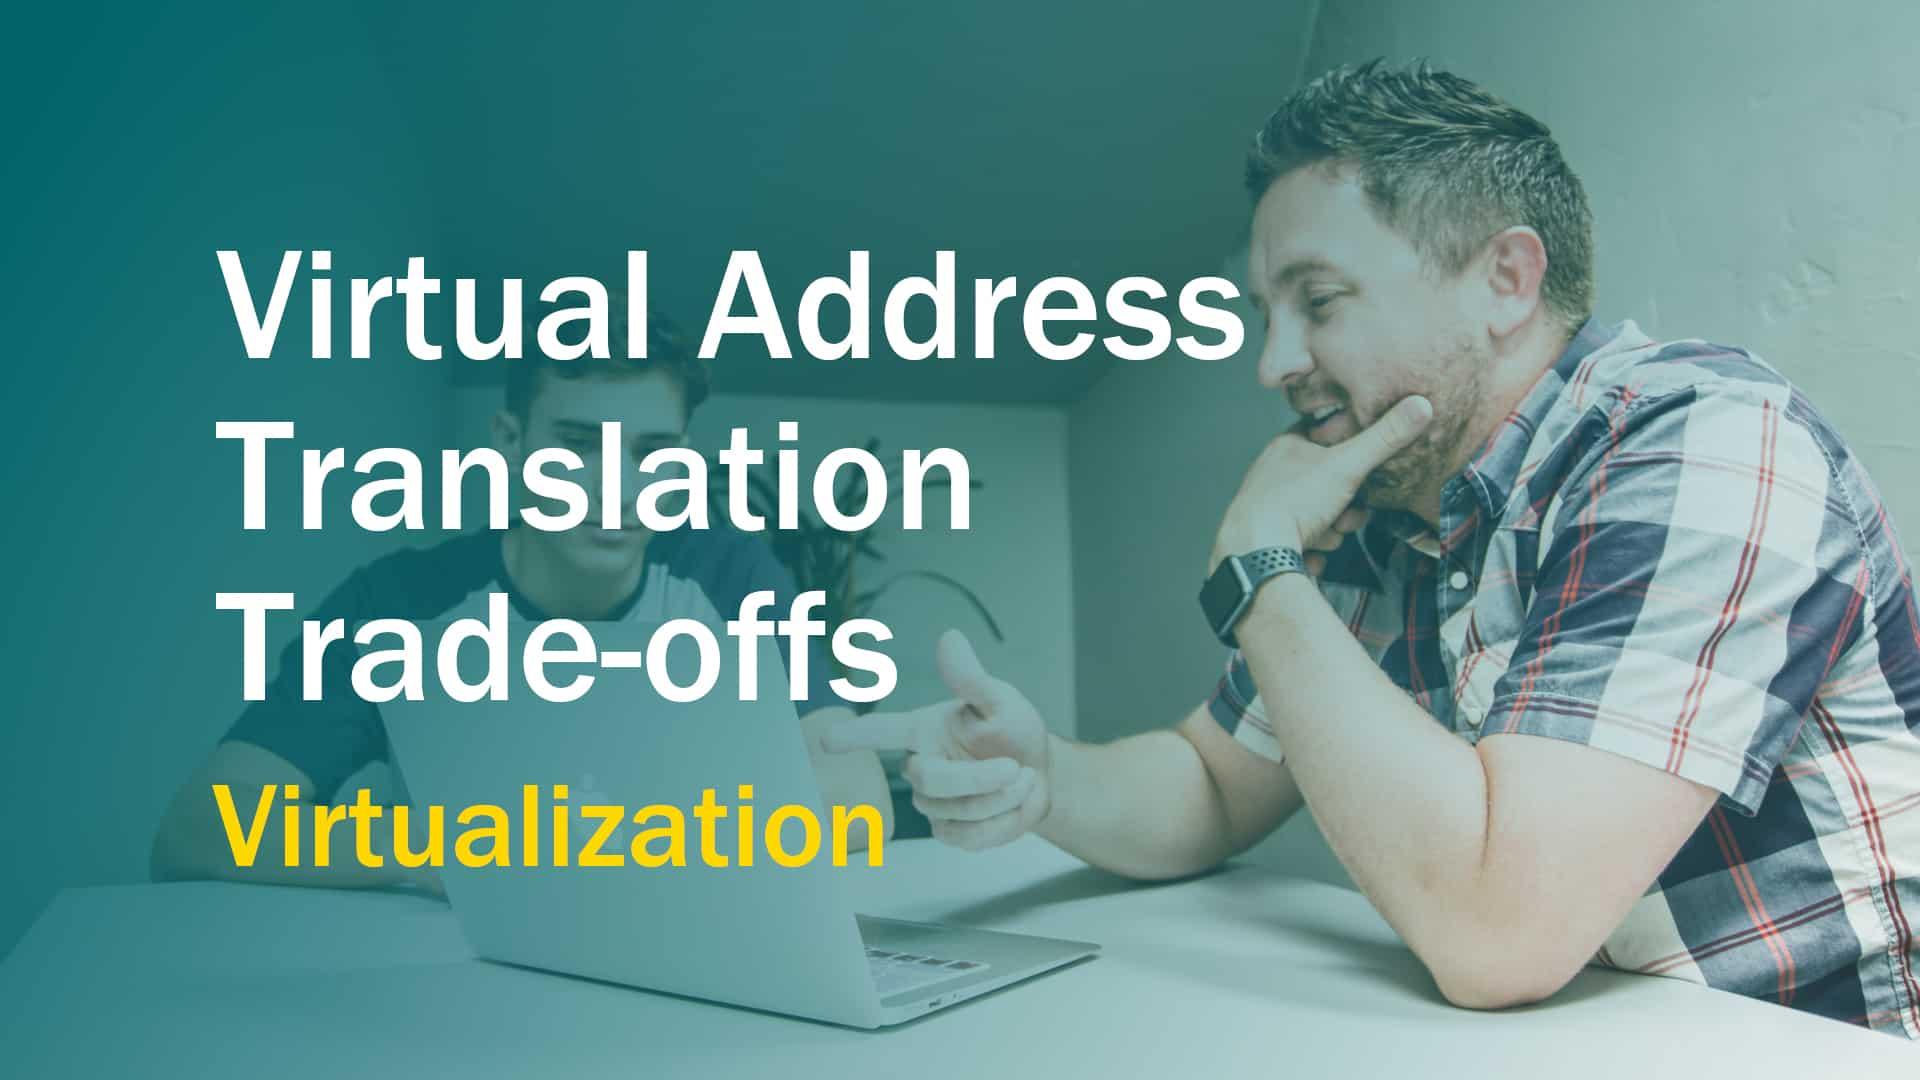 Virtual Address Translation Trade-offs: Speed vs Size